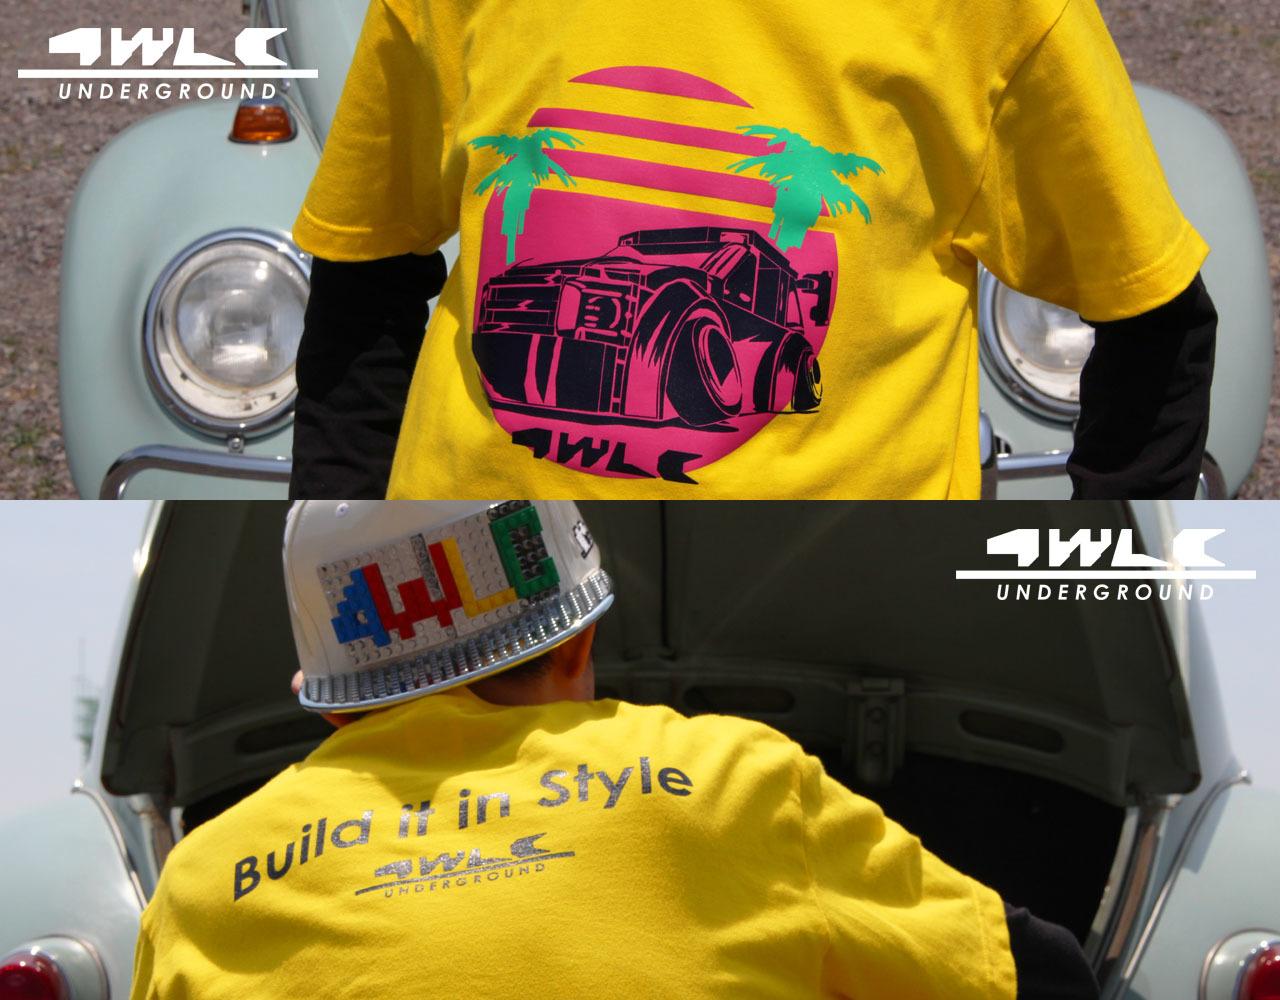 tshirt_4wlc_yellow_1.jpg